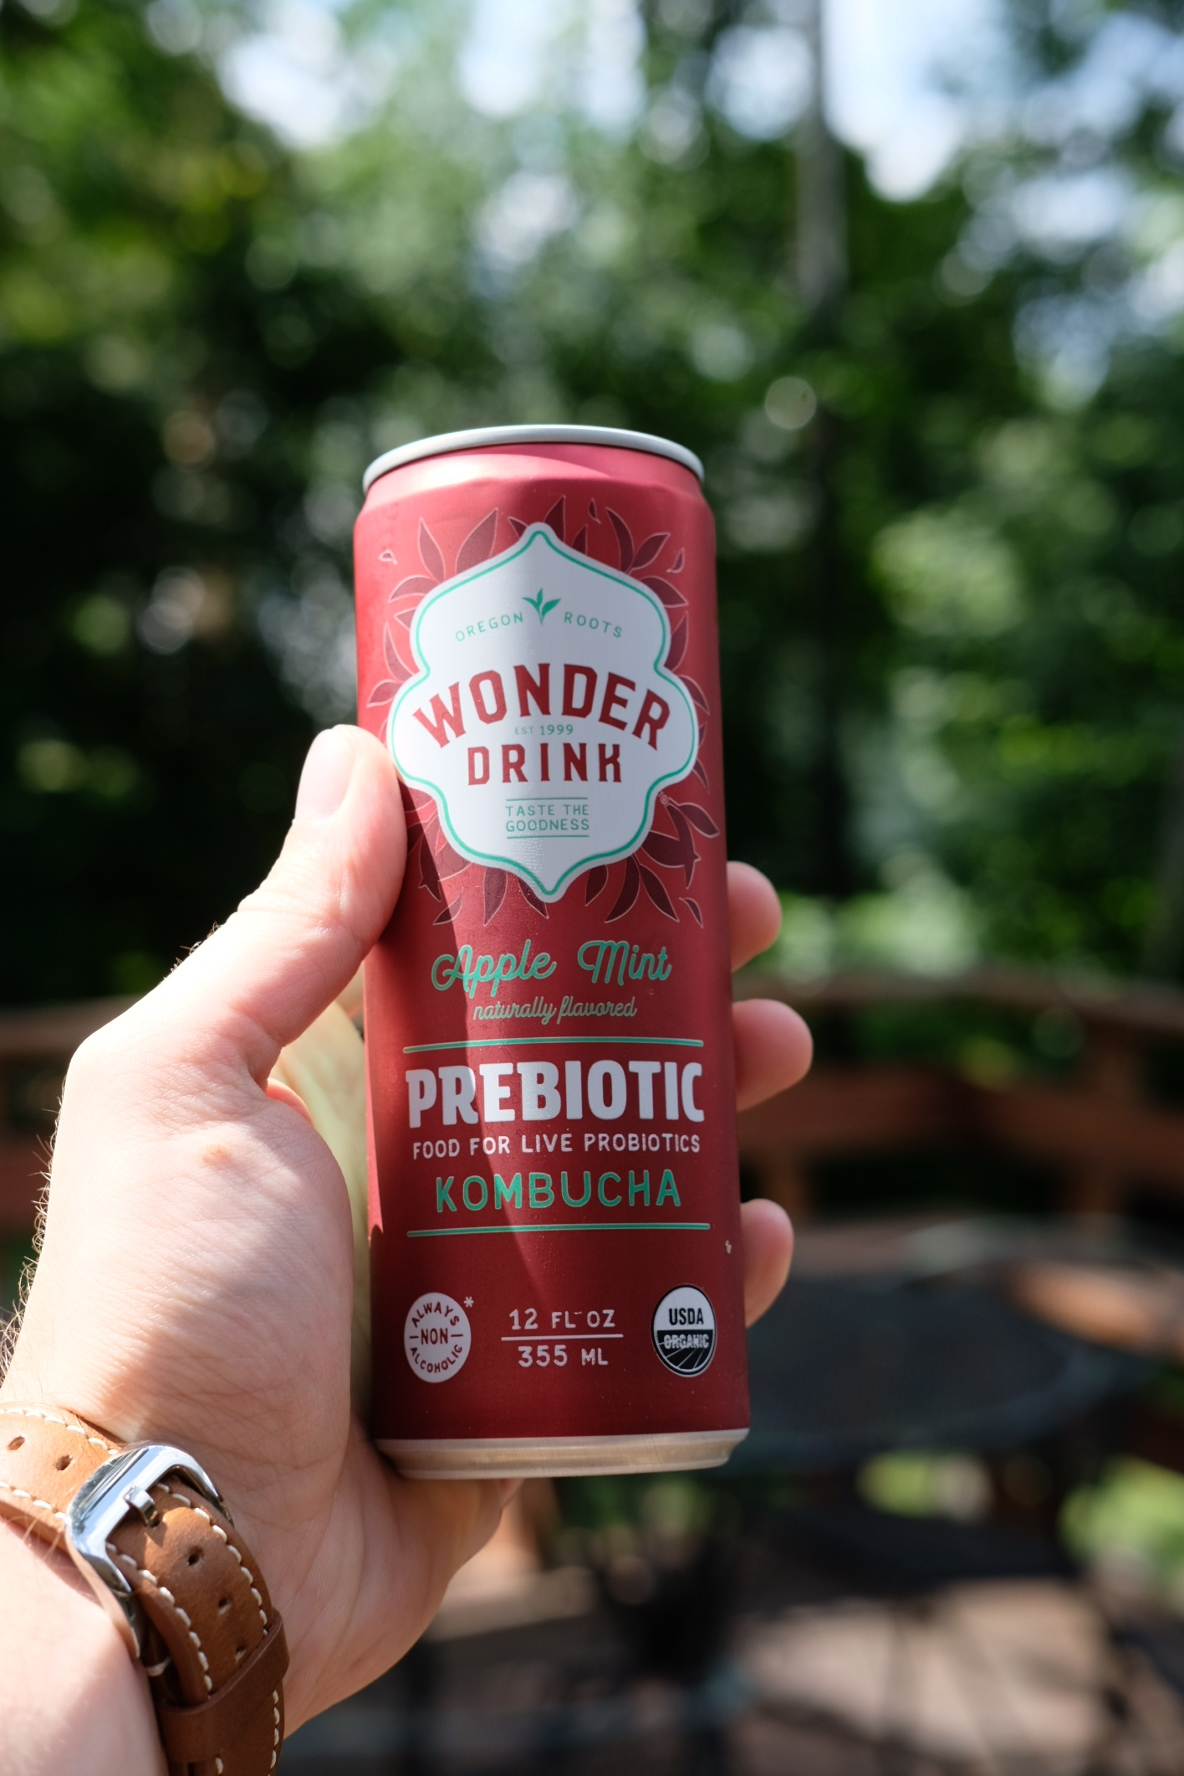 wonder-drink-kombucha